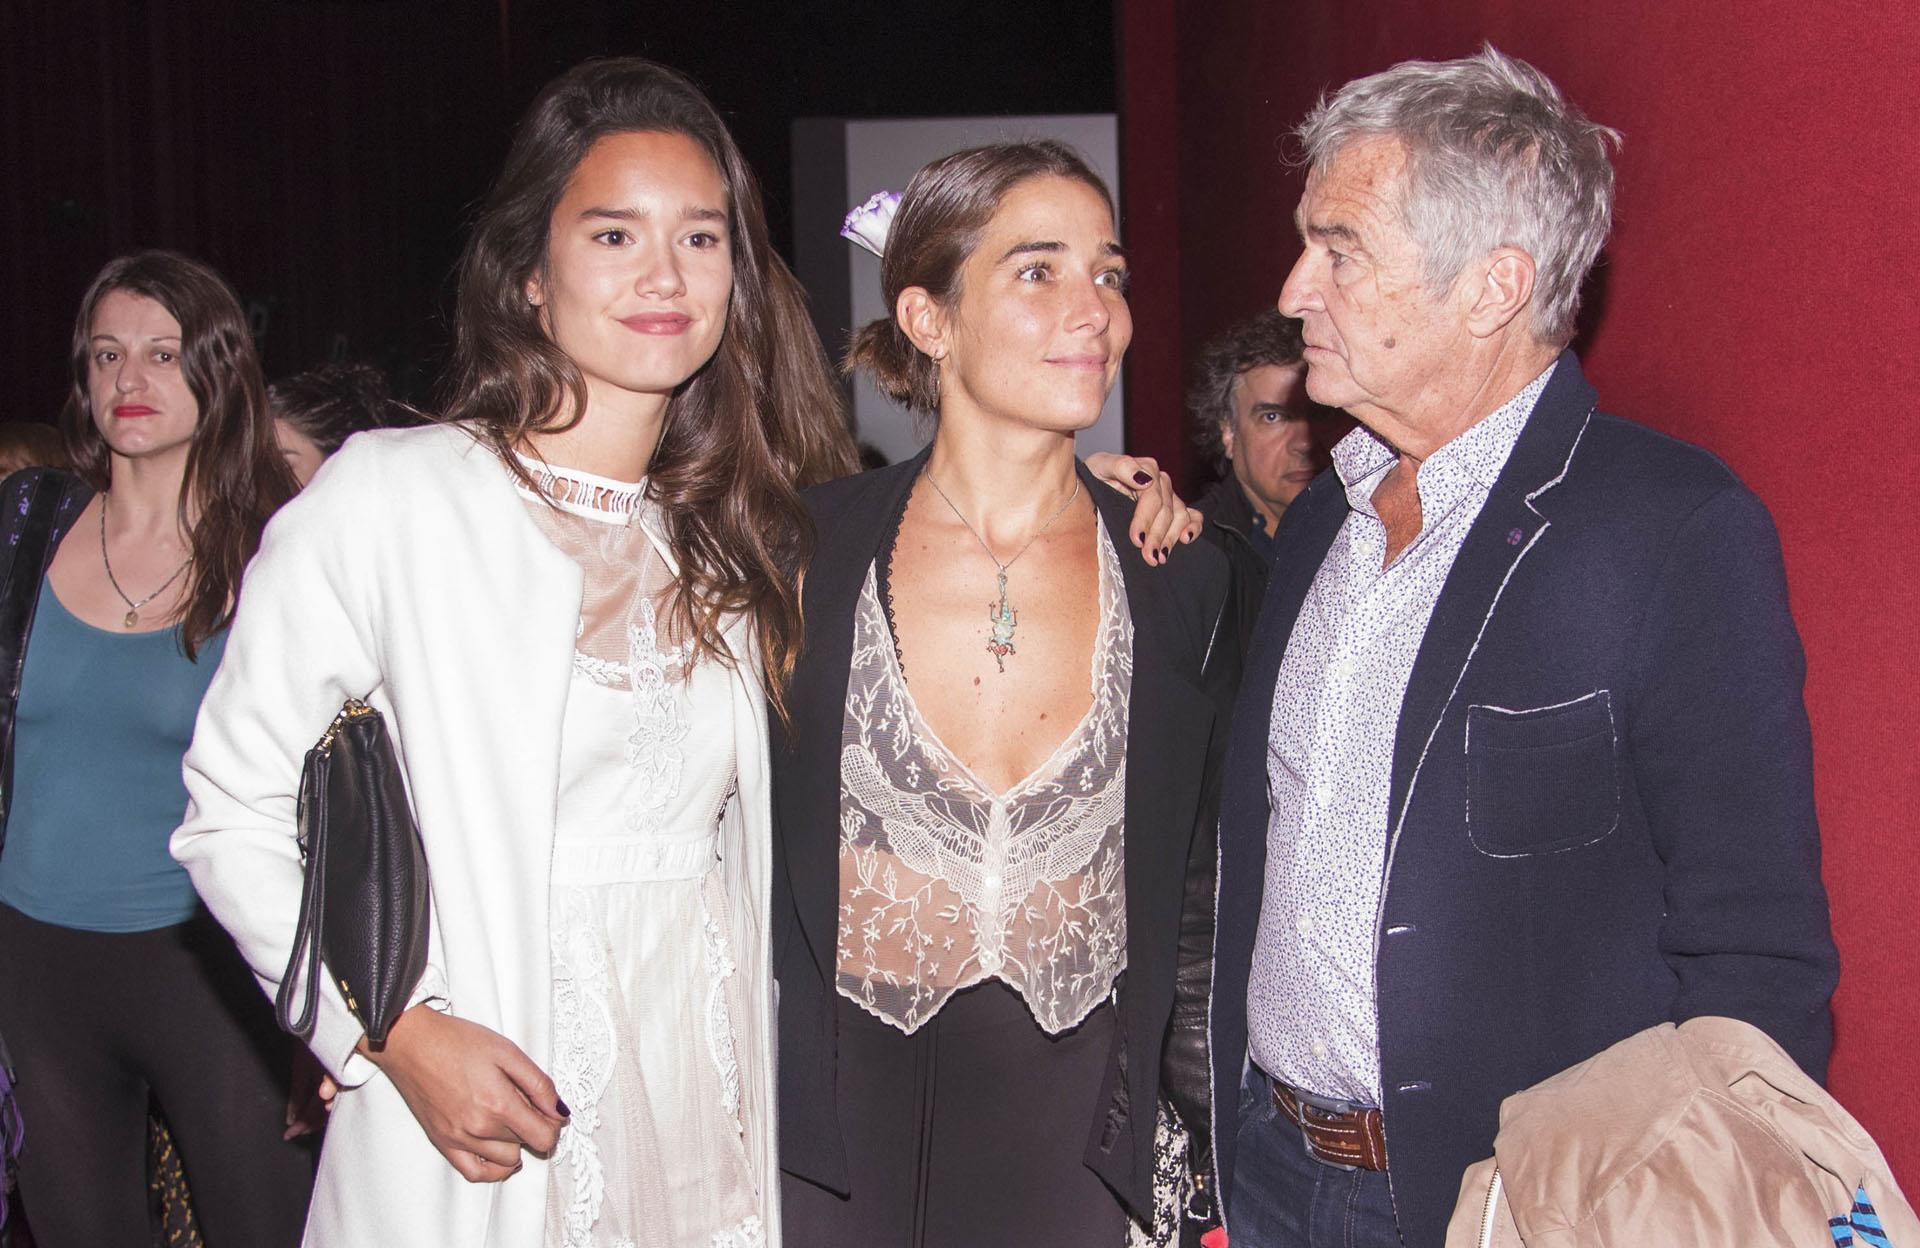 Manuela, Juana e Ignacio Viale